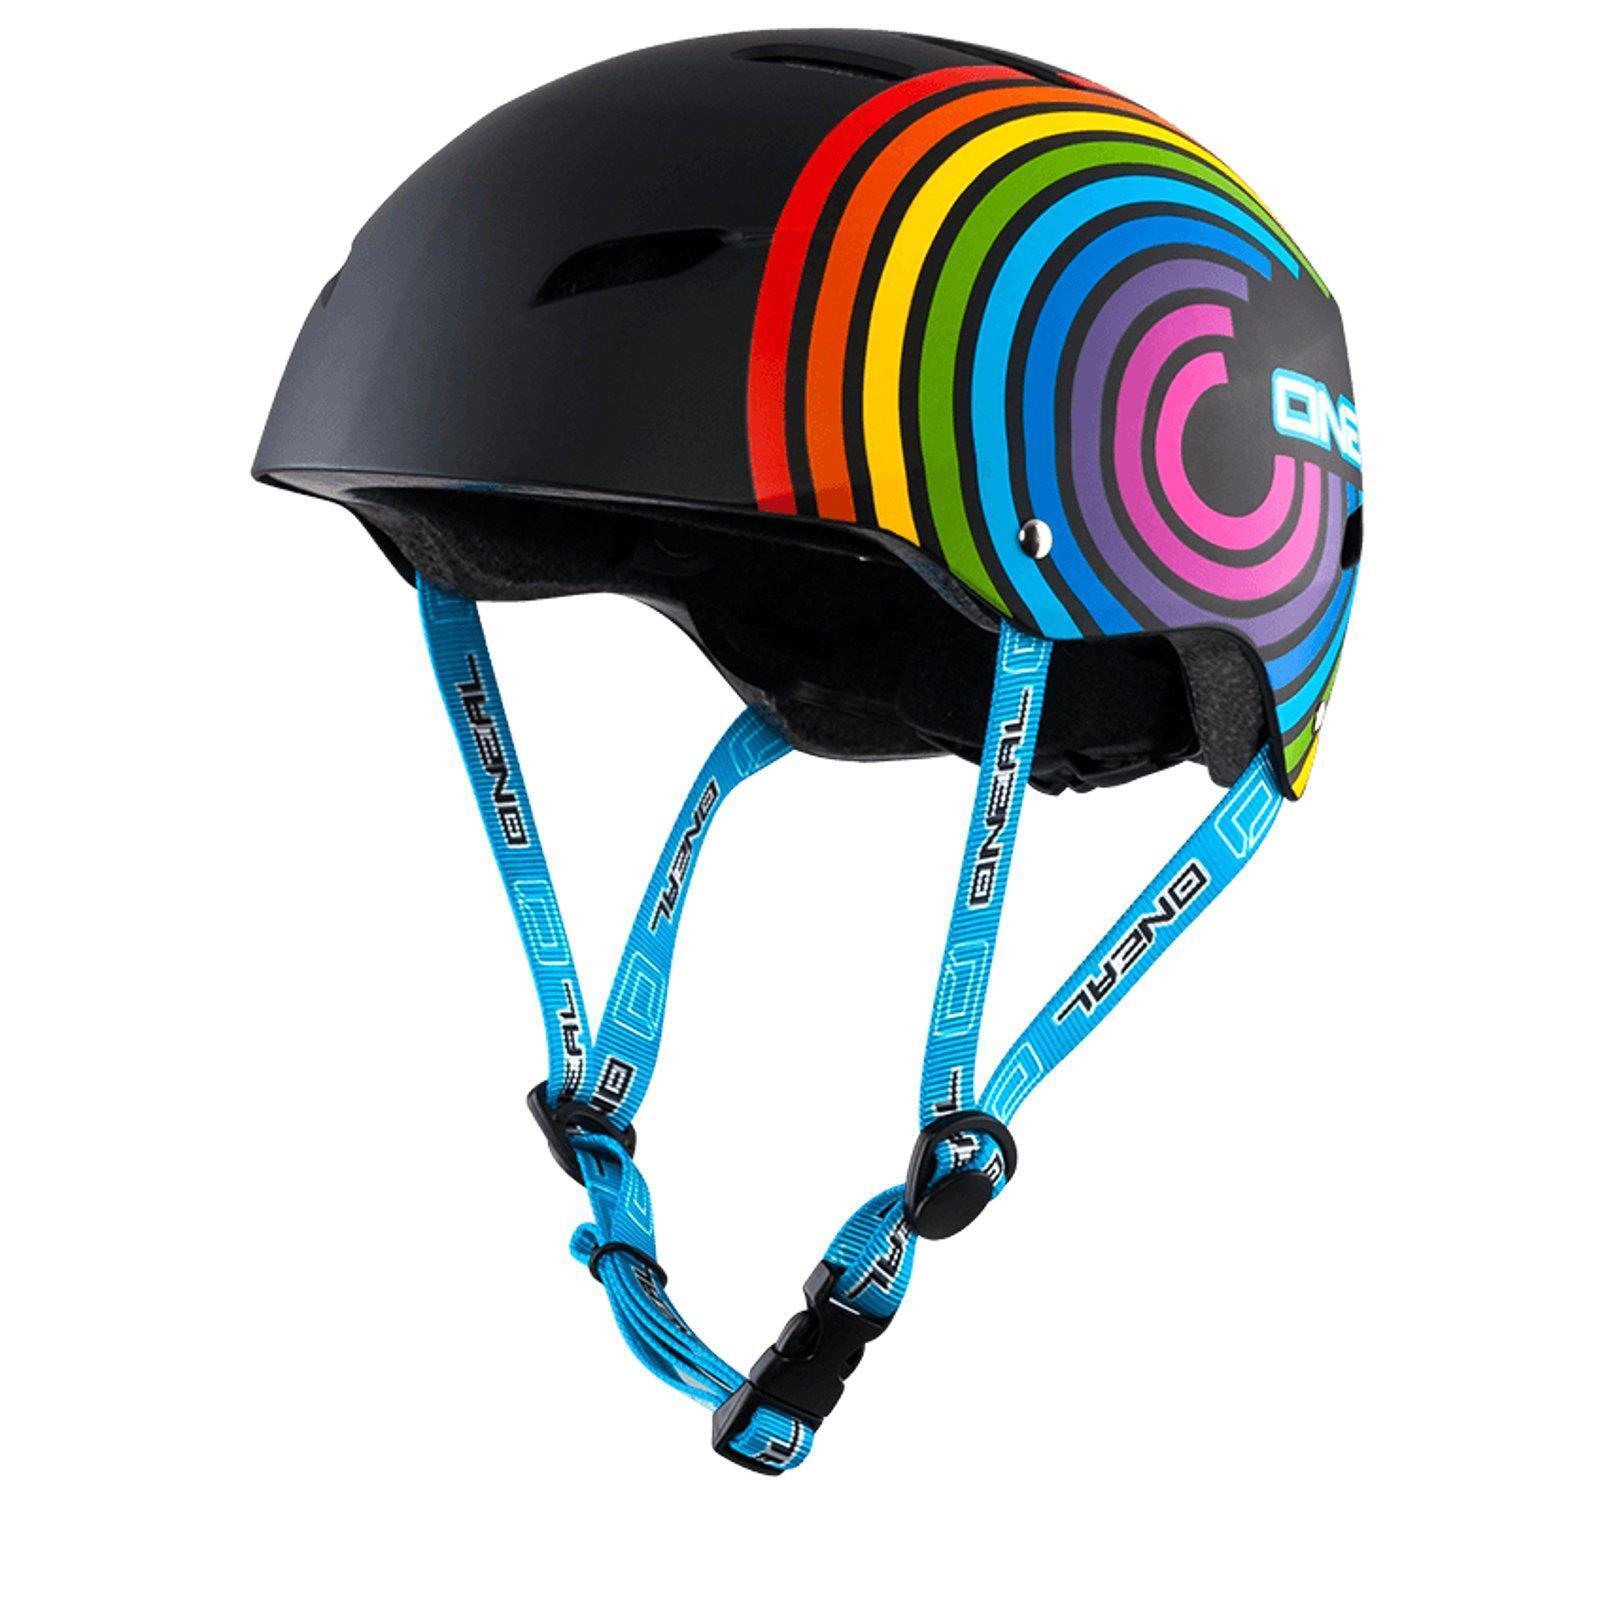 ONeal Dirt Lid Rainbow Kinder Helm Rainbow Lid BMX MTB Skate Inliner Fahrrad Kids Scooter FR 0ae282